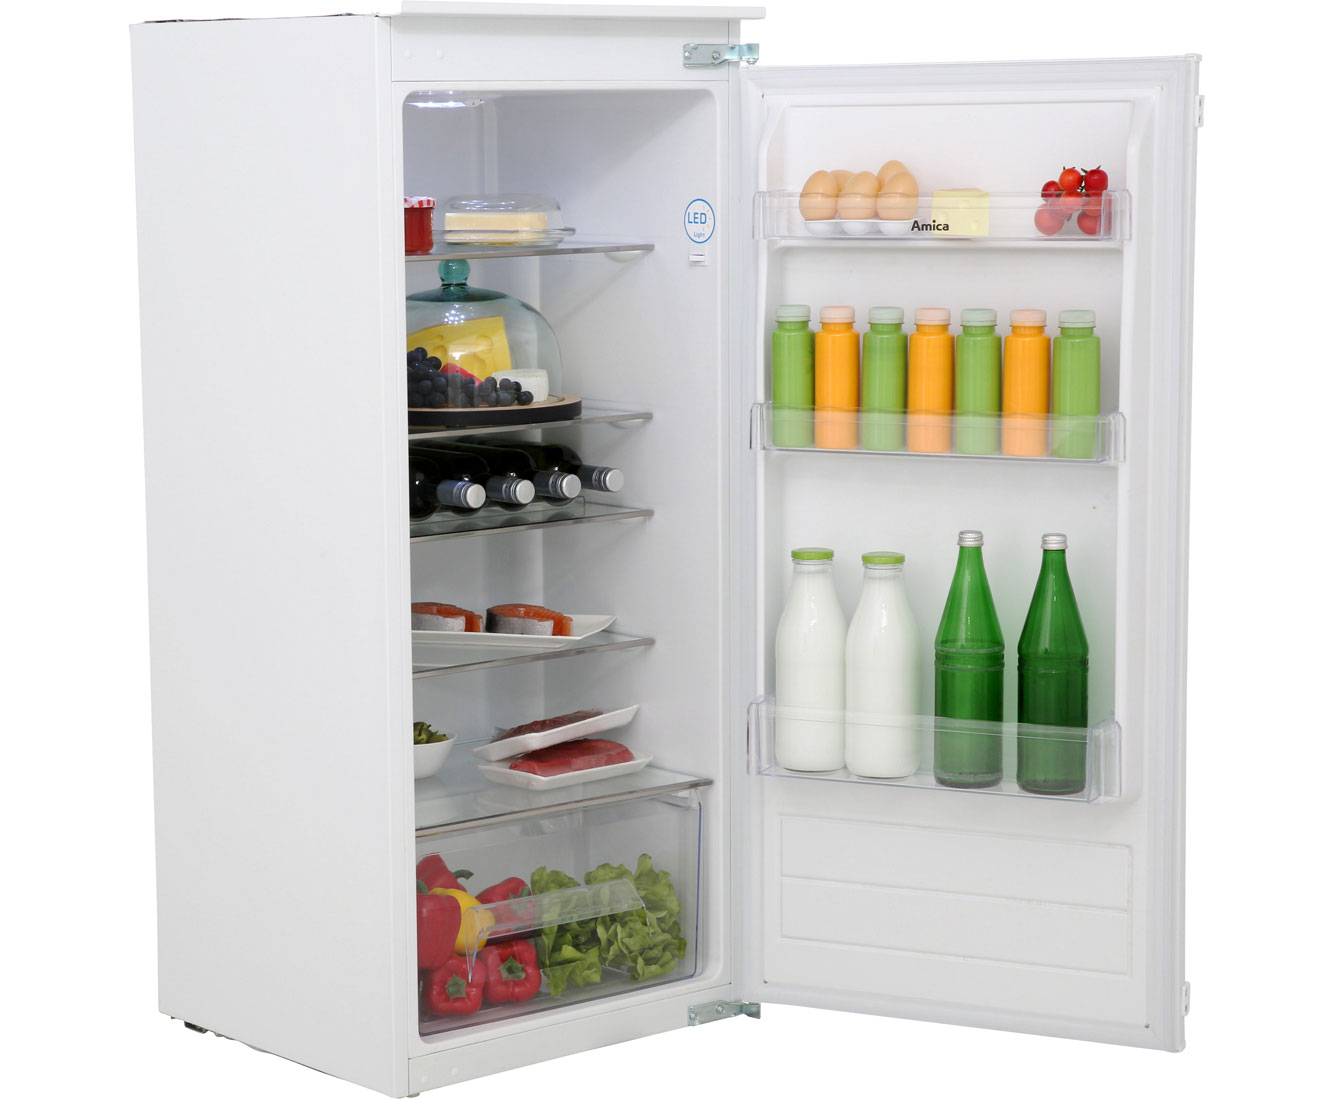 Amica Kühlschrank Blau : Rabatt preisvergleich.de haushalt u003e großgeräte u003e kühlschränke